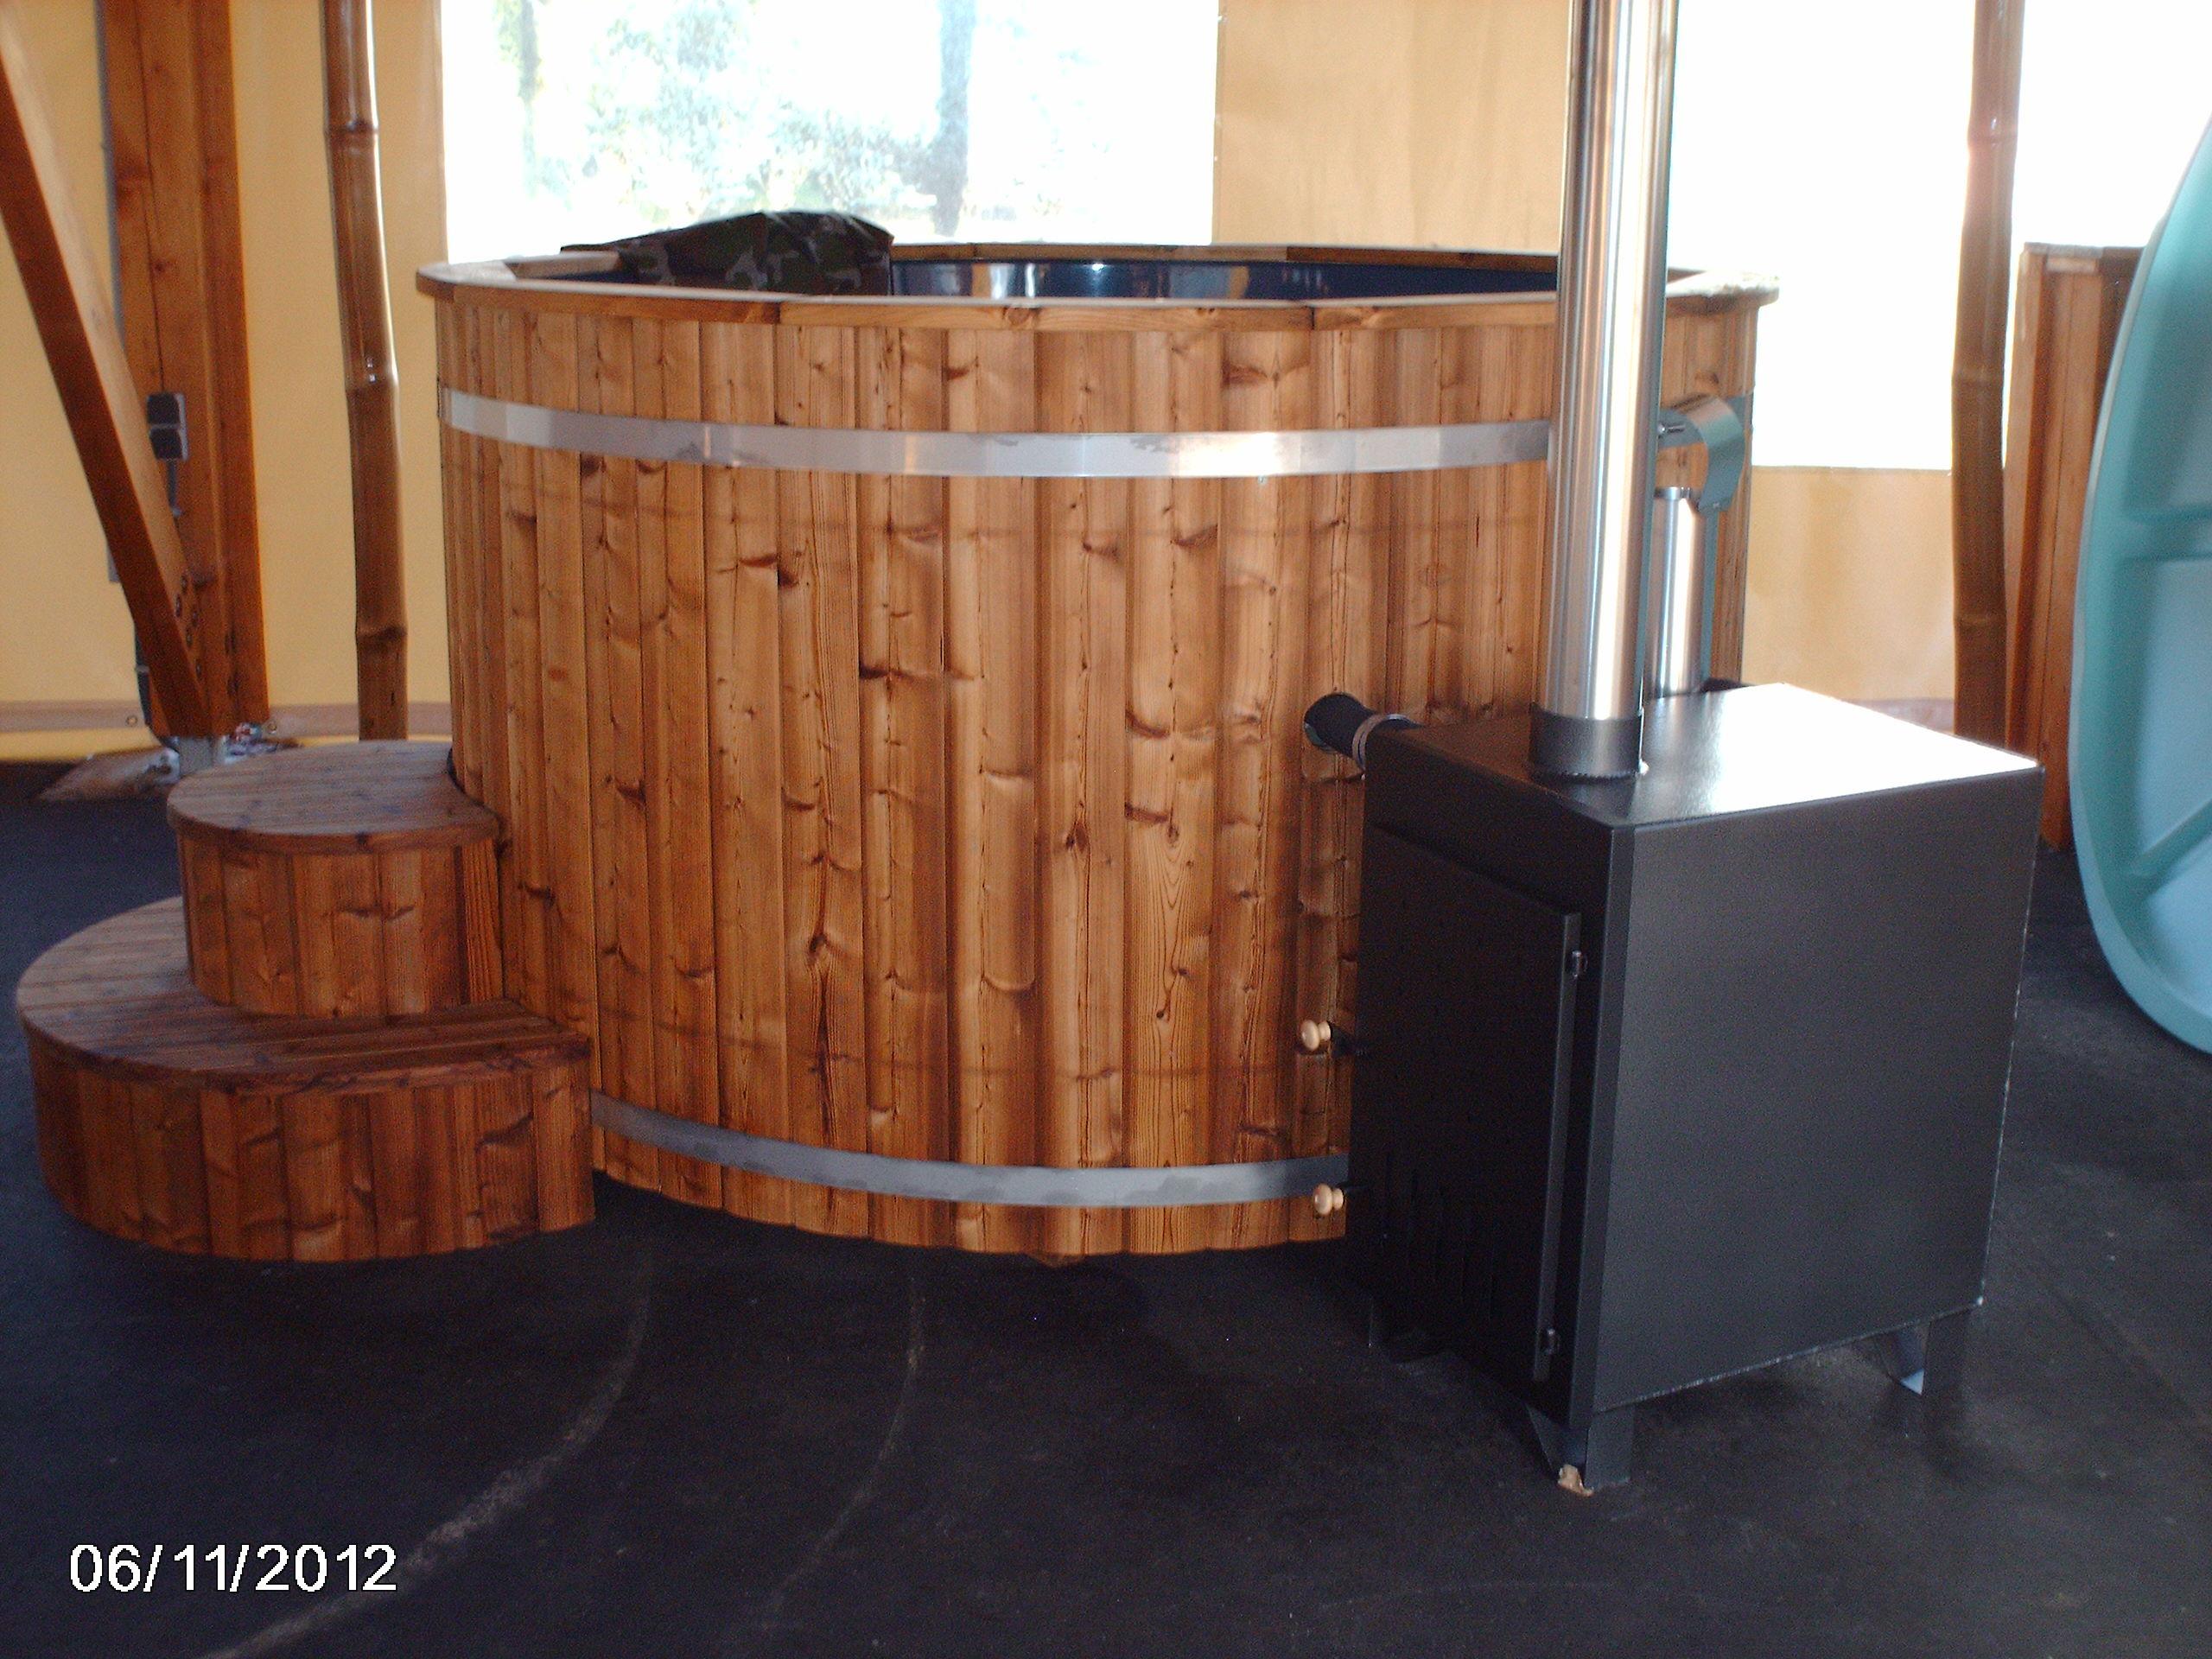 hll insolite une roulotte dans votre jardin ou camping kota original insolite. Black Bedroom Furniture Sets. Home Design Ideas